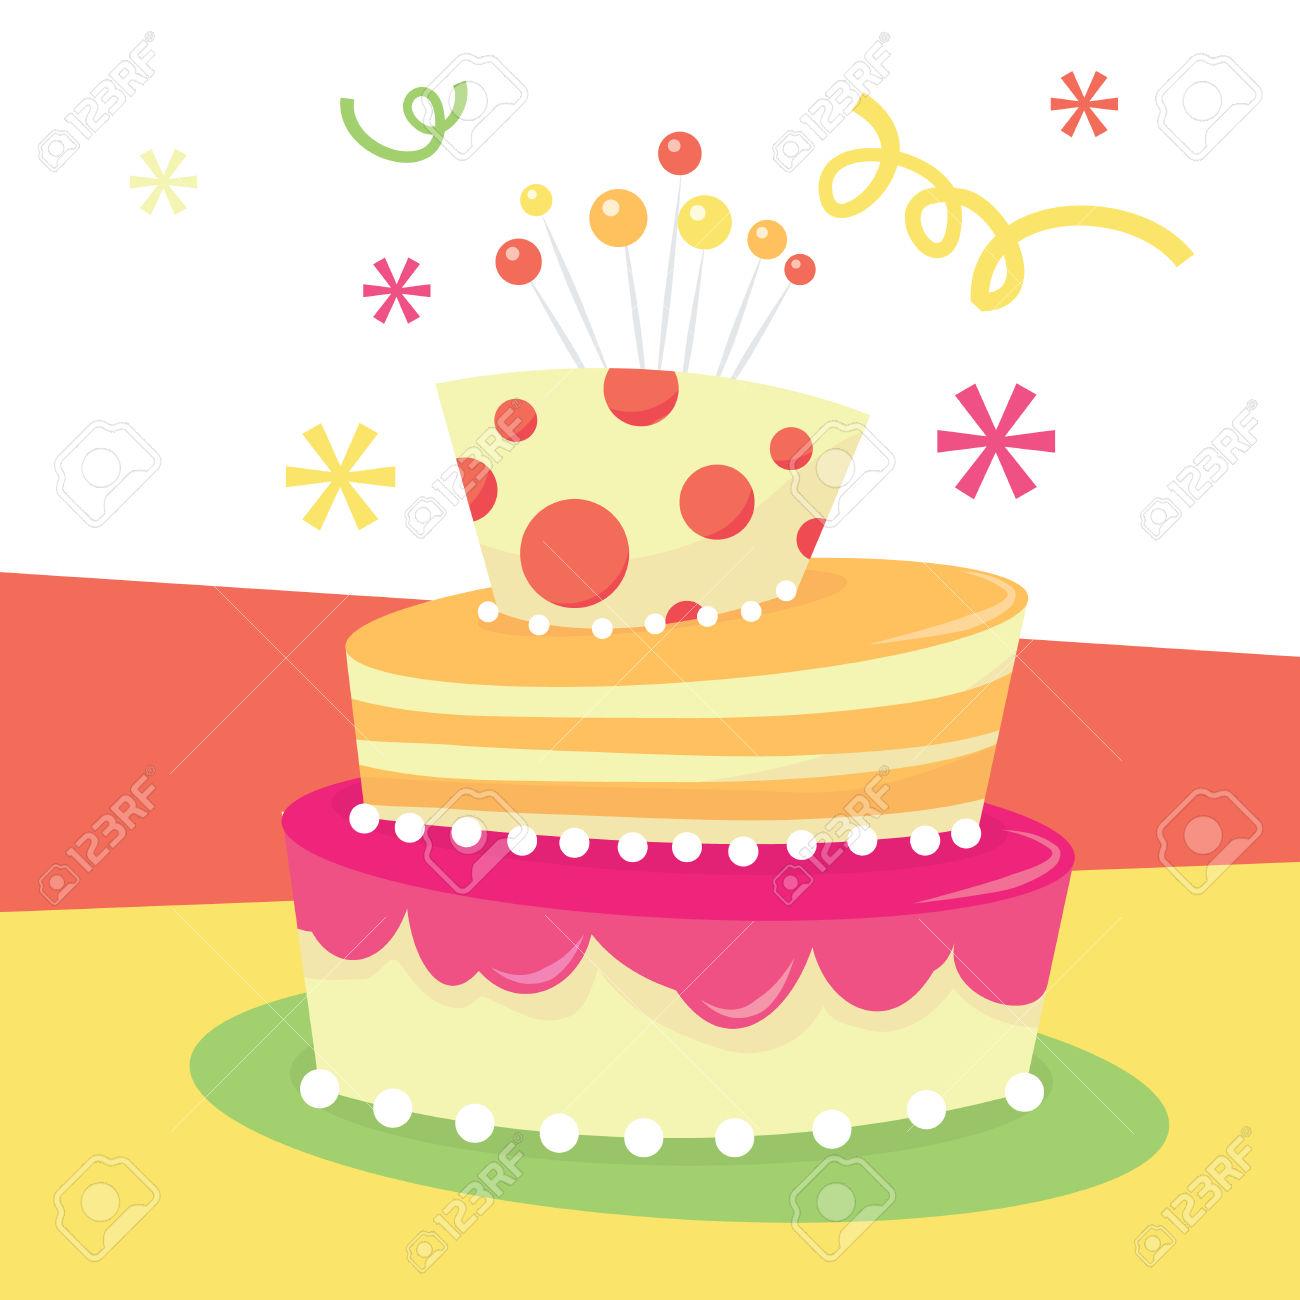 Whimsical Birthday Cake Clipart.